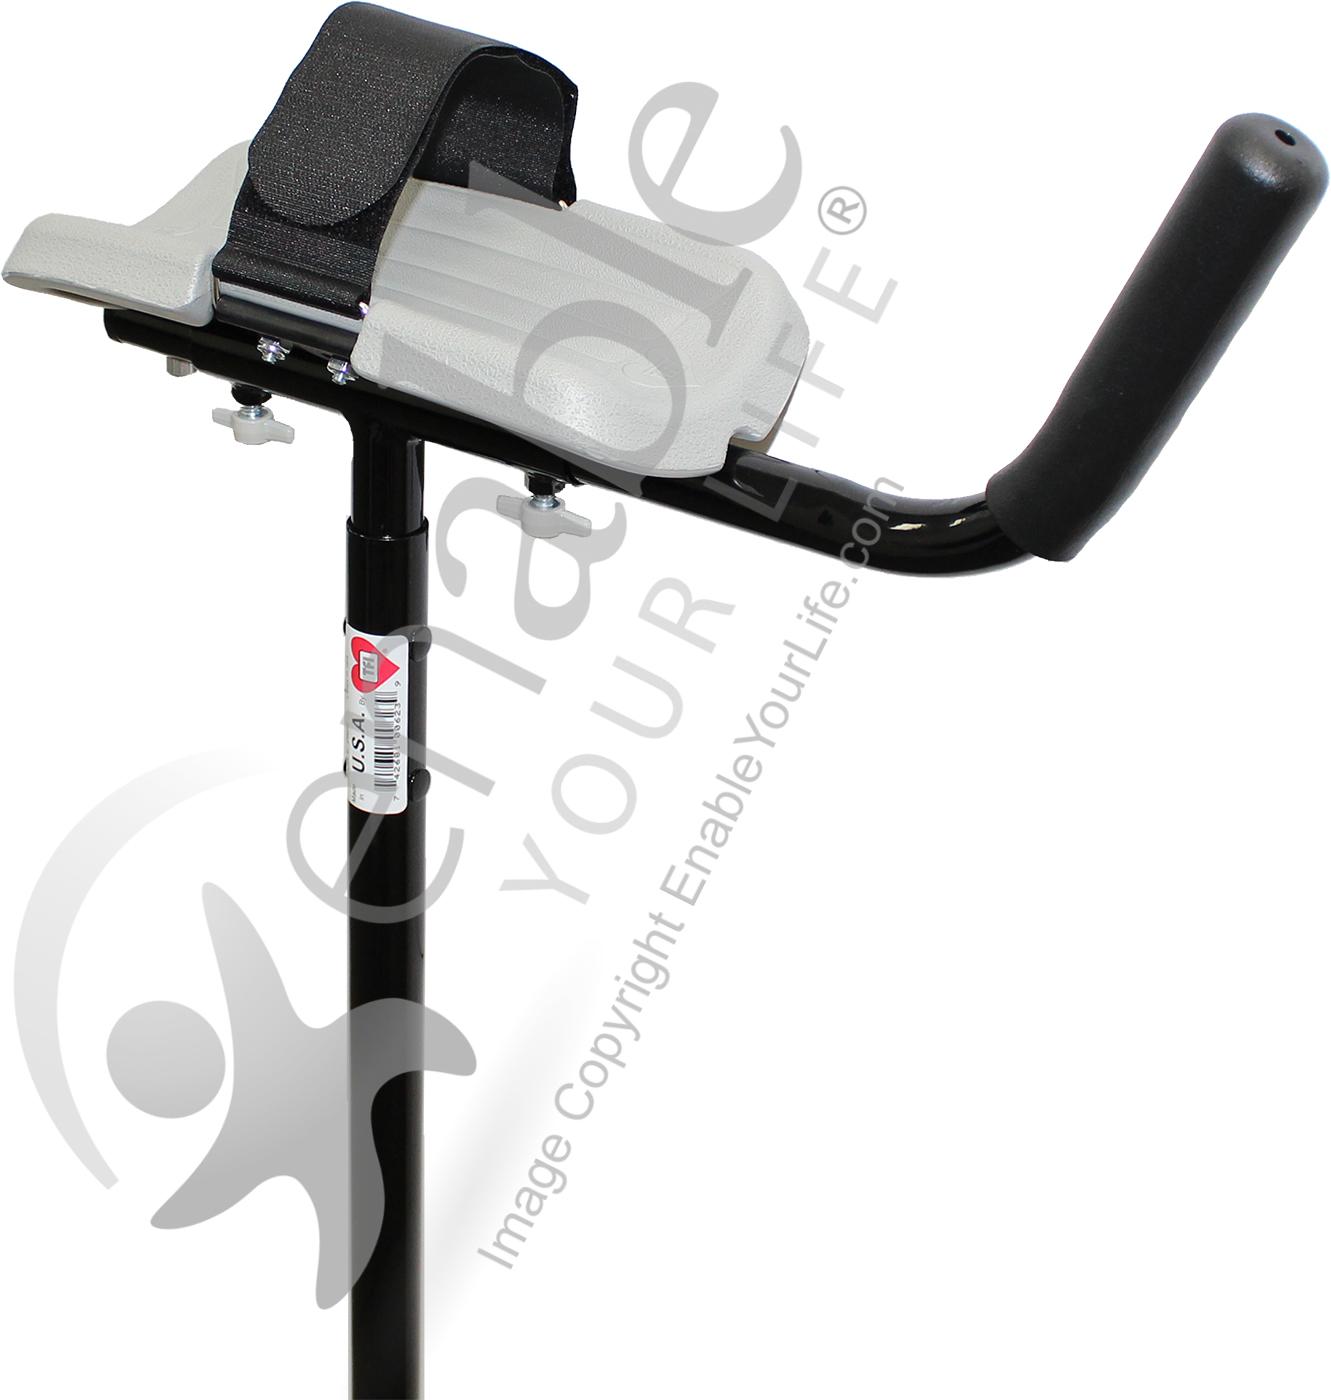 Tfi Platform Forearm Crutch